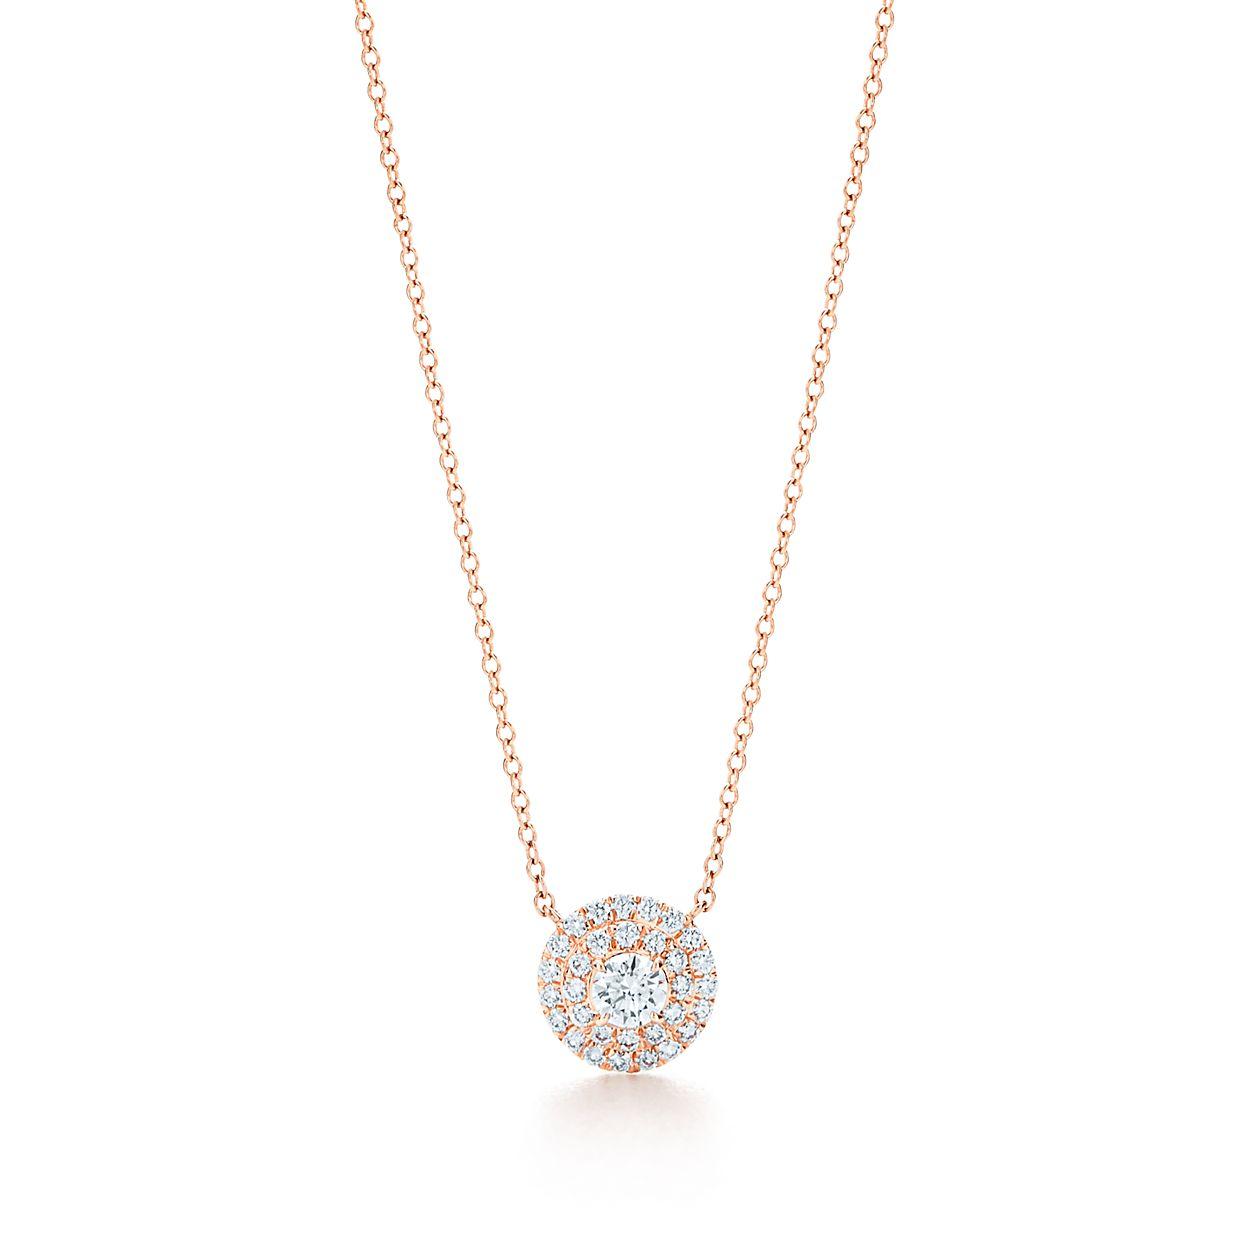 Tiffany soleste pendant in 18k rose gold with diamonds tiffany co tiffany solestependant tiffany solestependant aloadofball Gallery